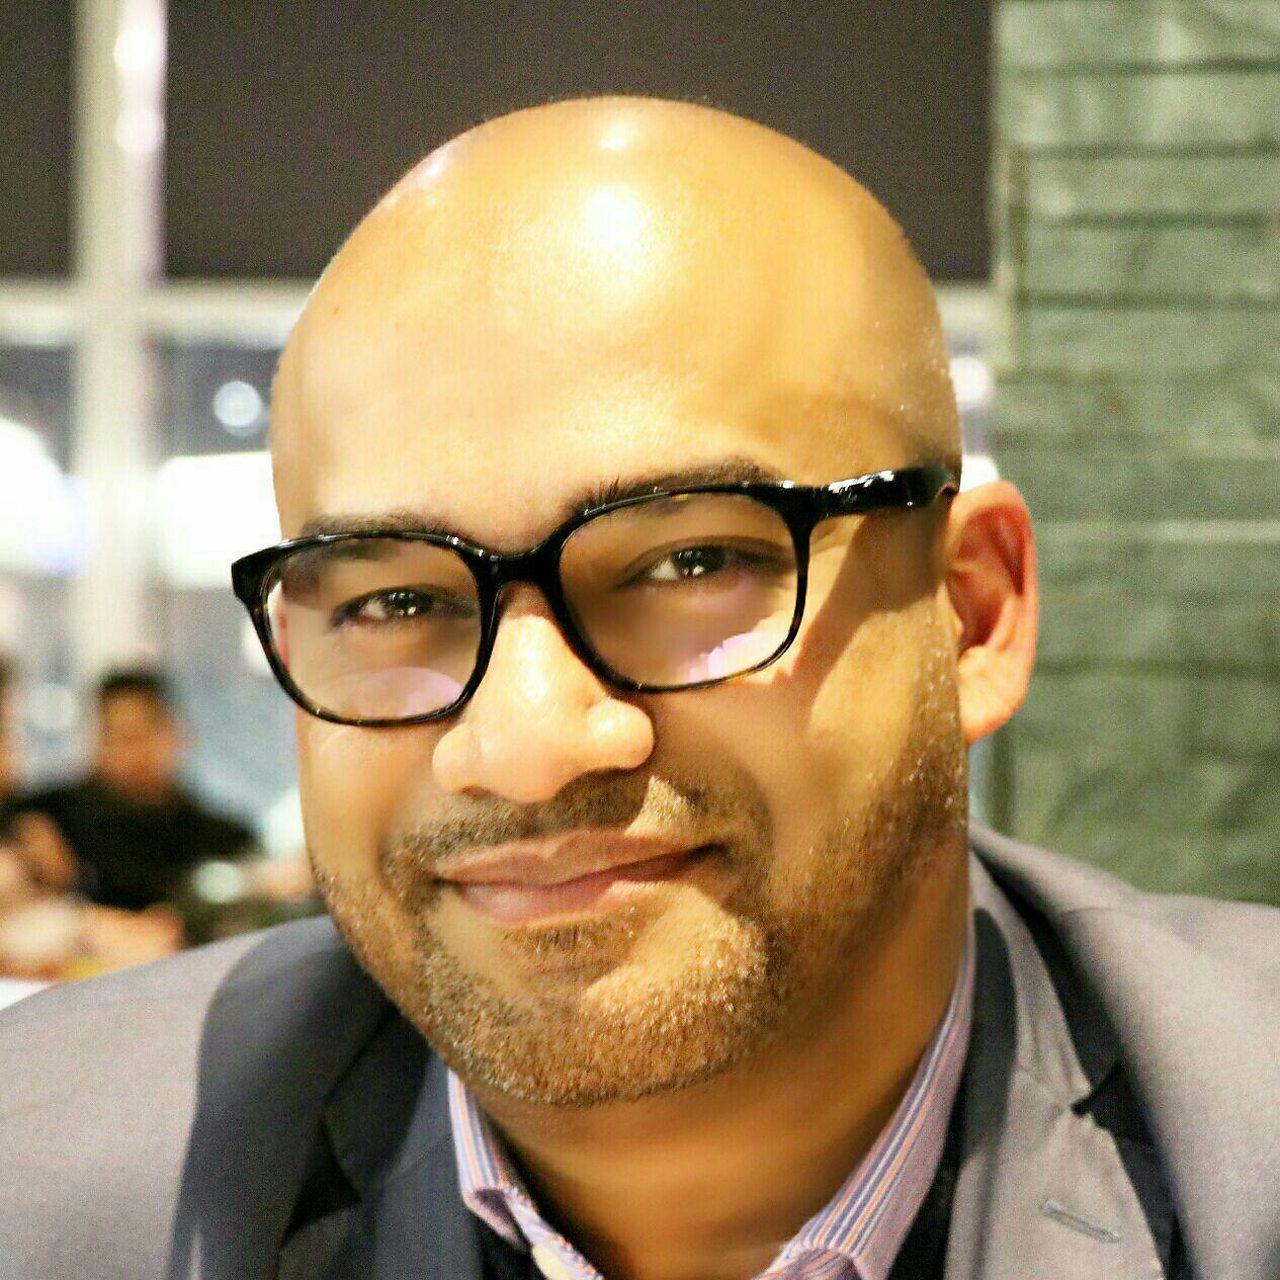 Maswood Ahmed